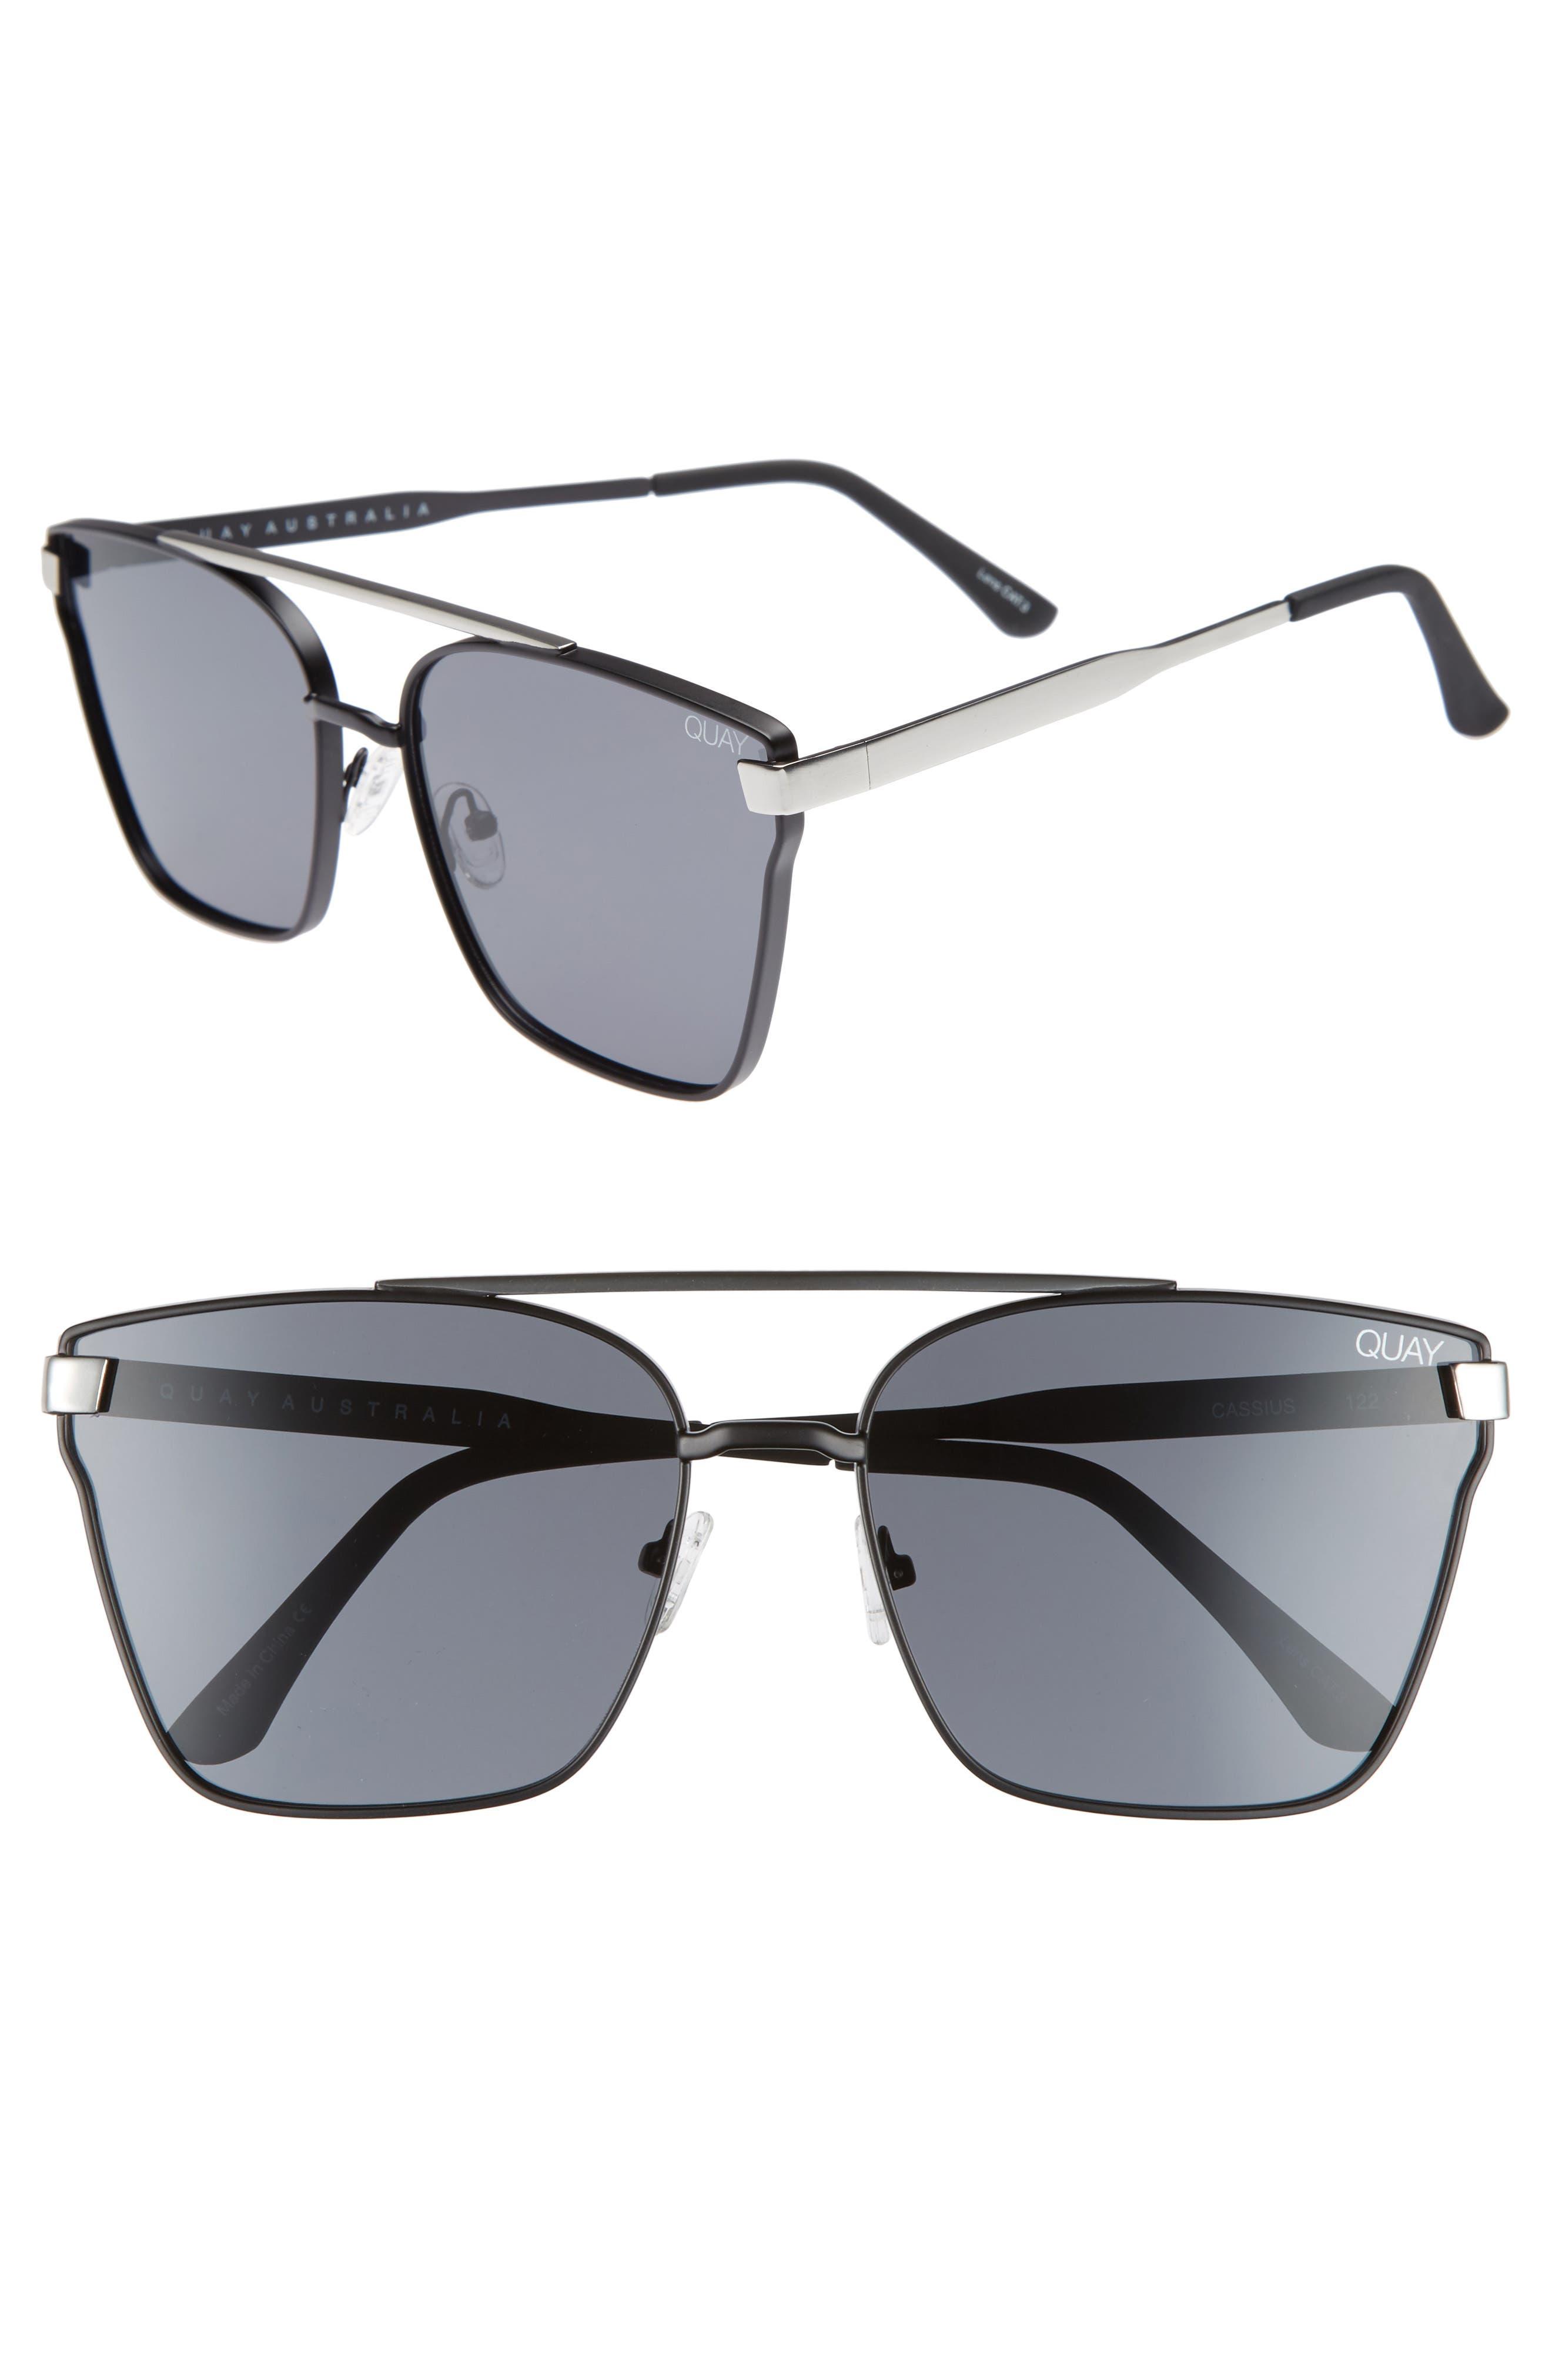 Cassius 59mm Navigator Sunglasses,                             Main thumbnail 1, color,                             001